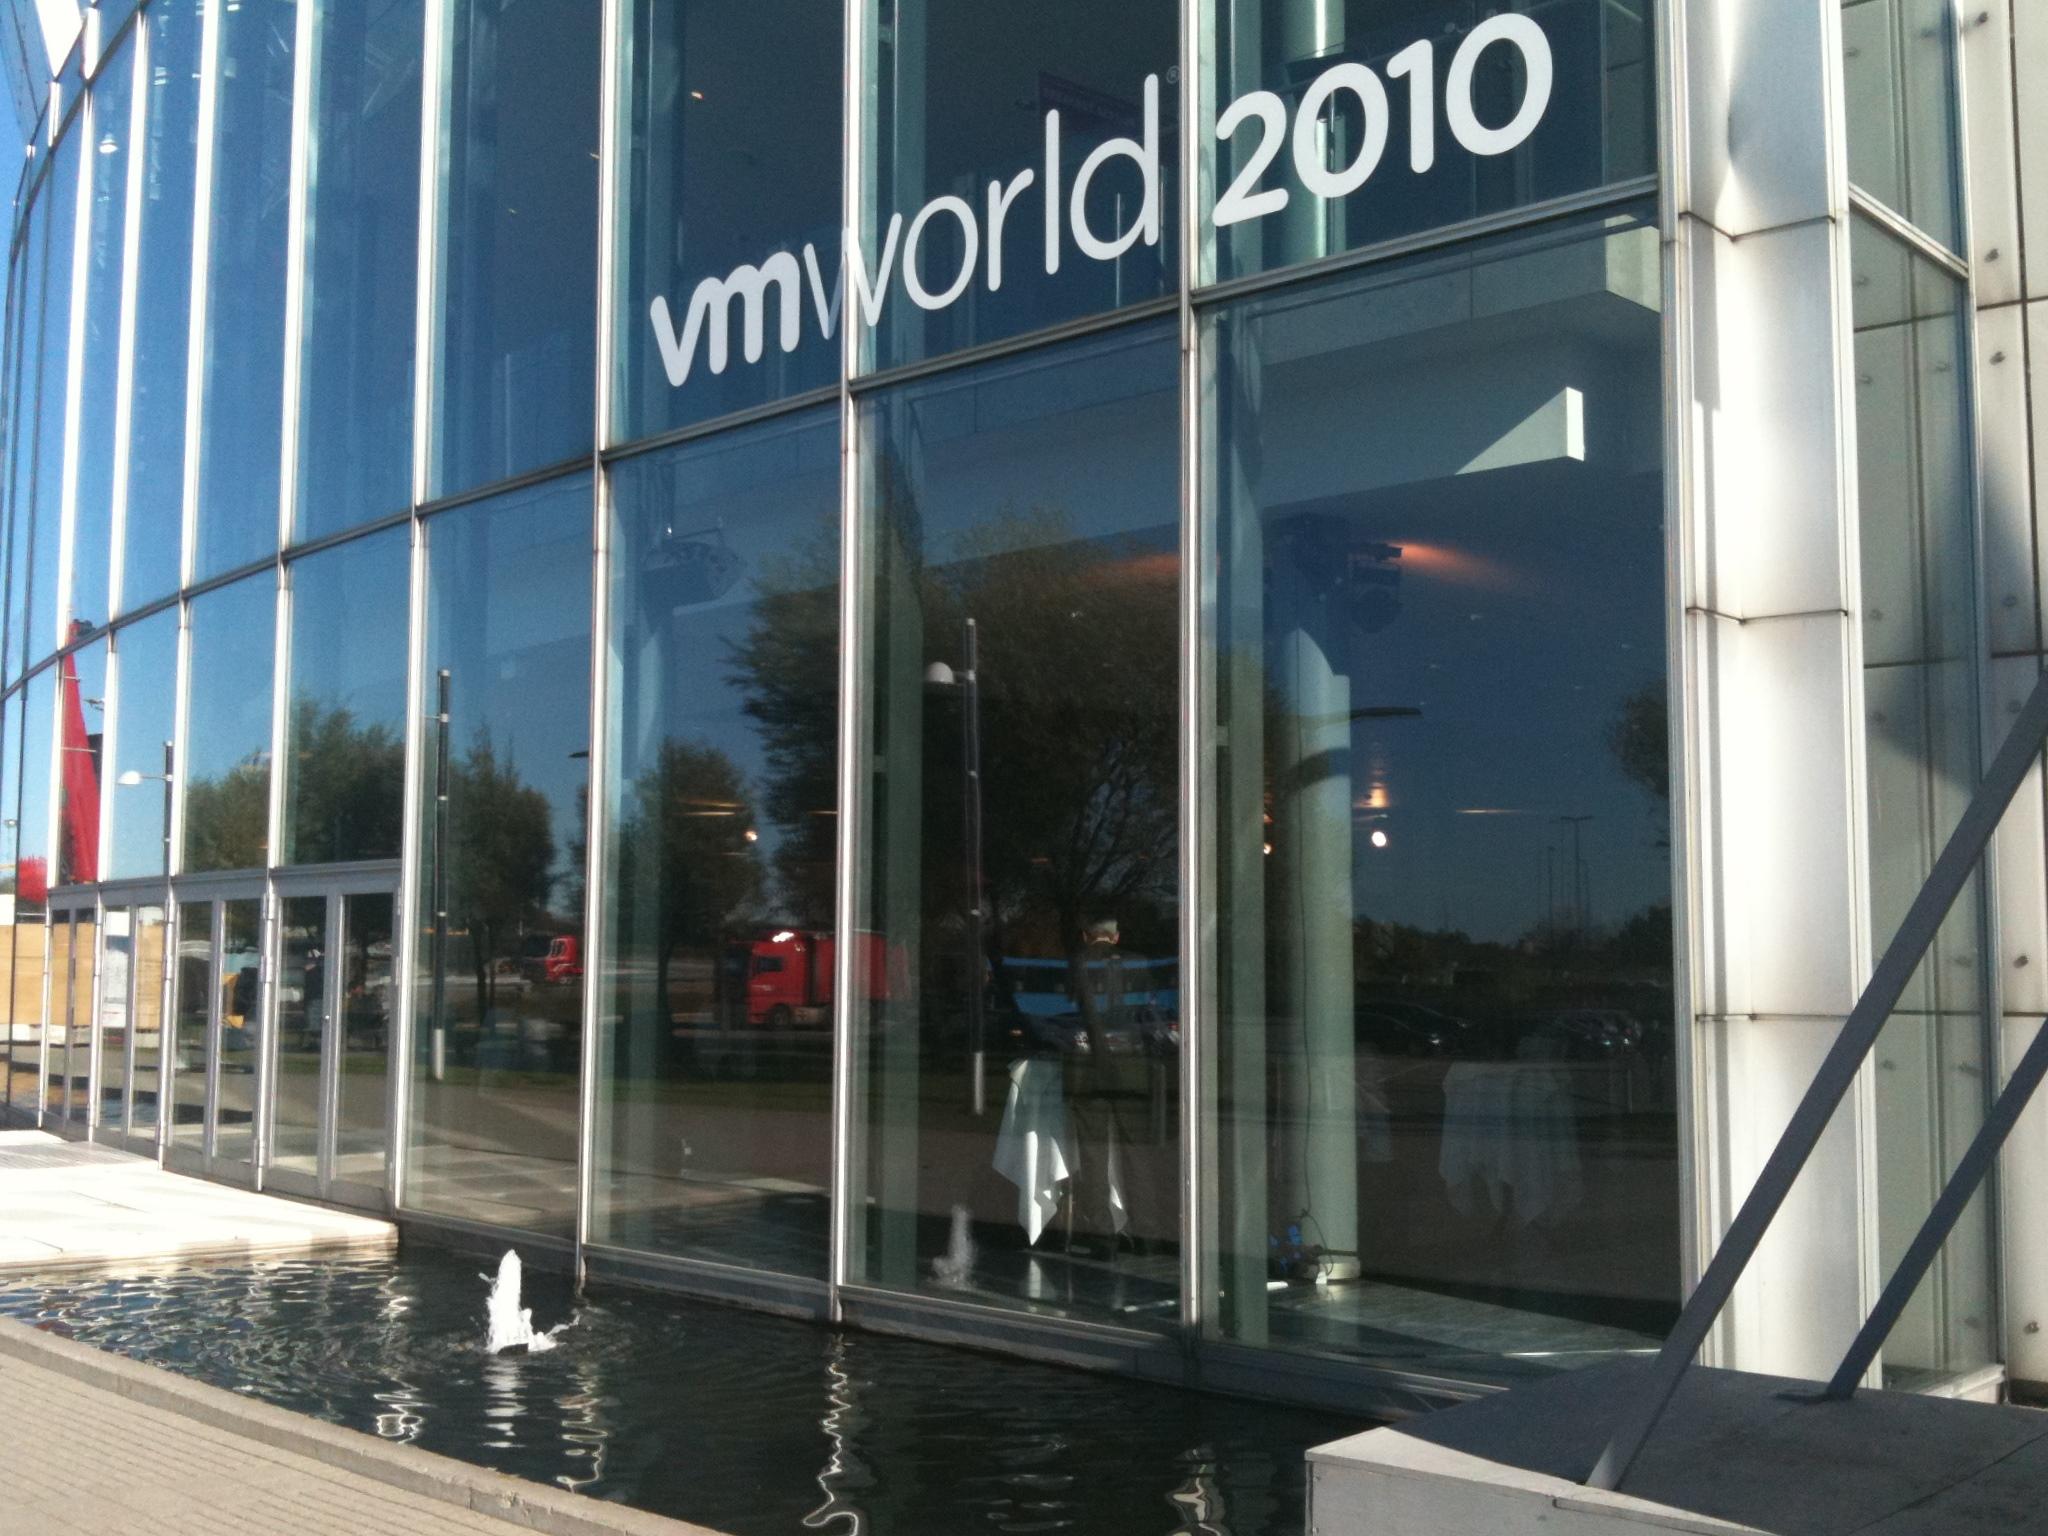 VMworld 2010